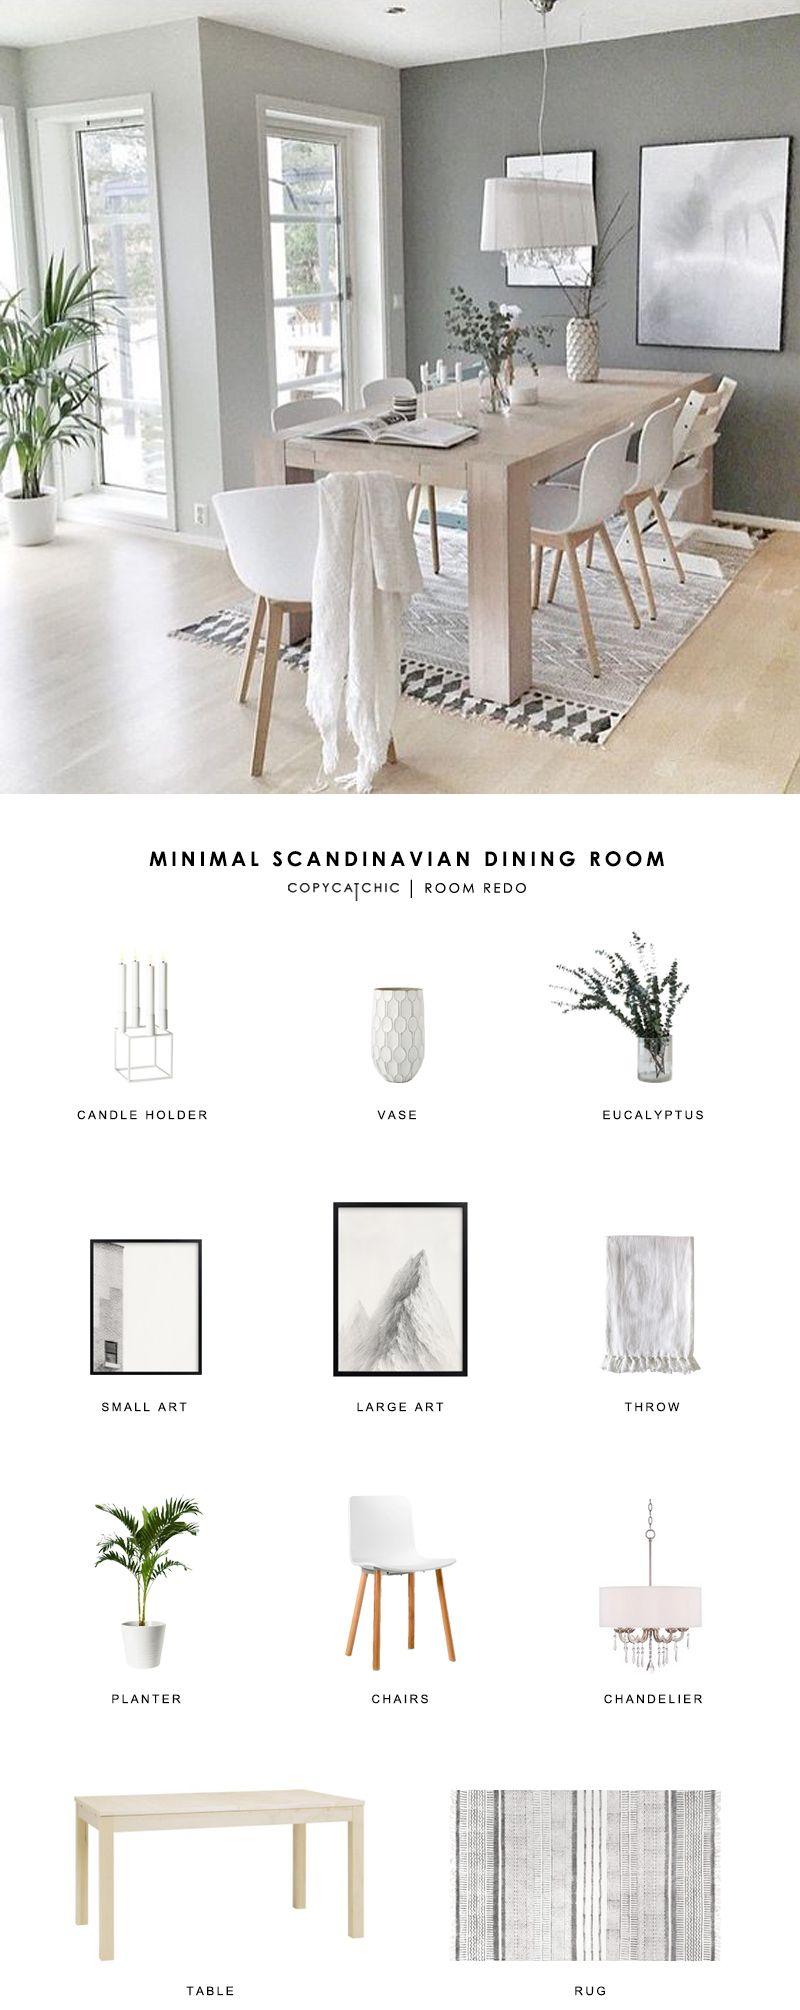 Photo of Copy Cat Chic Room Redo | Minimal Scandinavian Dining Room – copycatchic